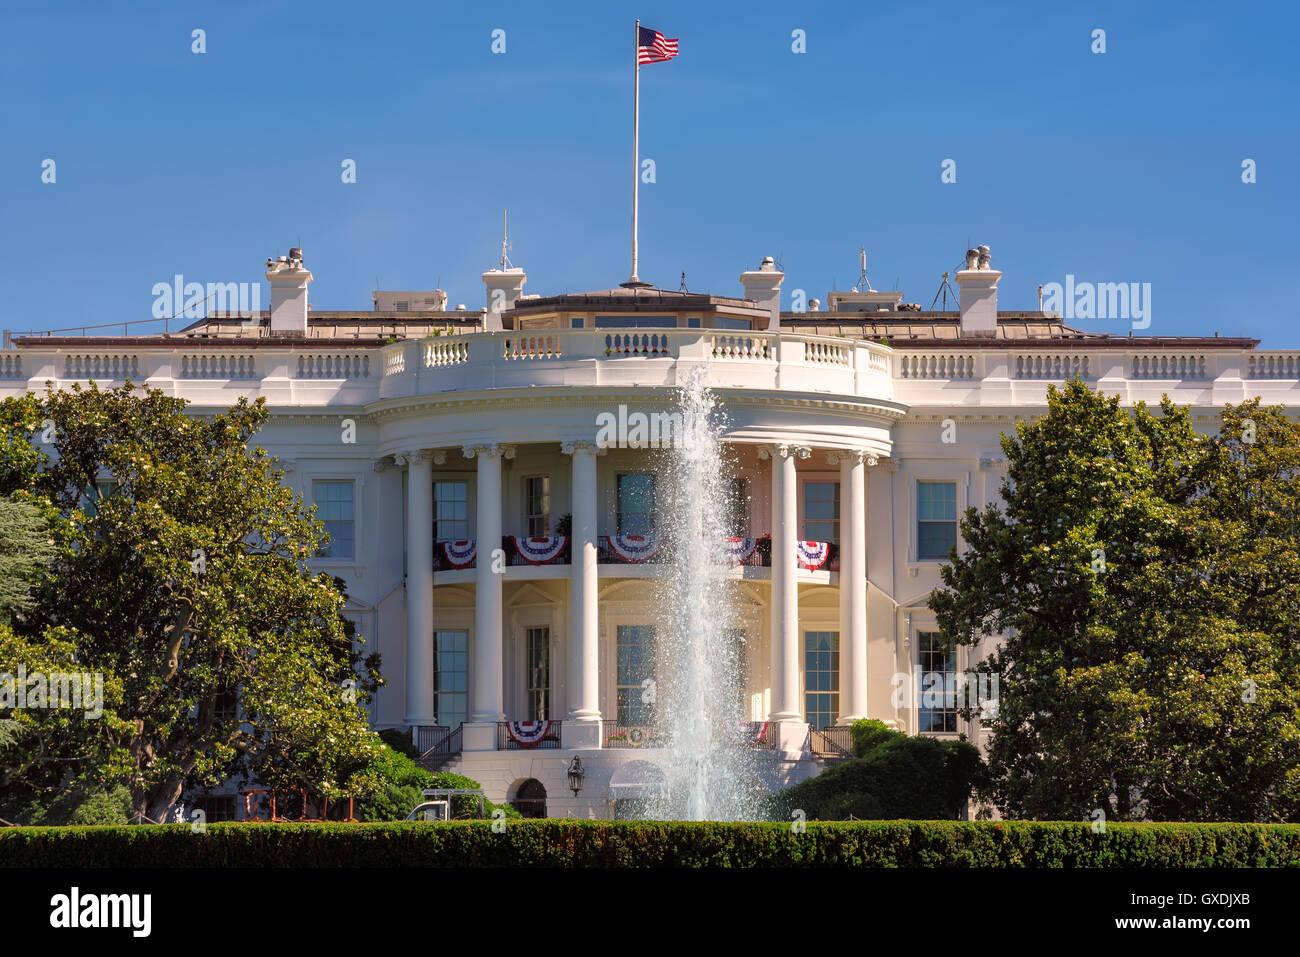 The White House in Washington DC - Stock Image